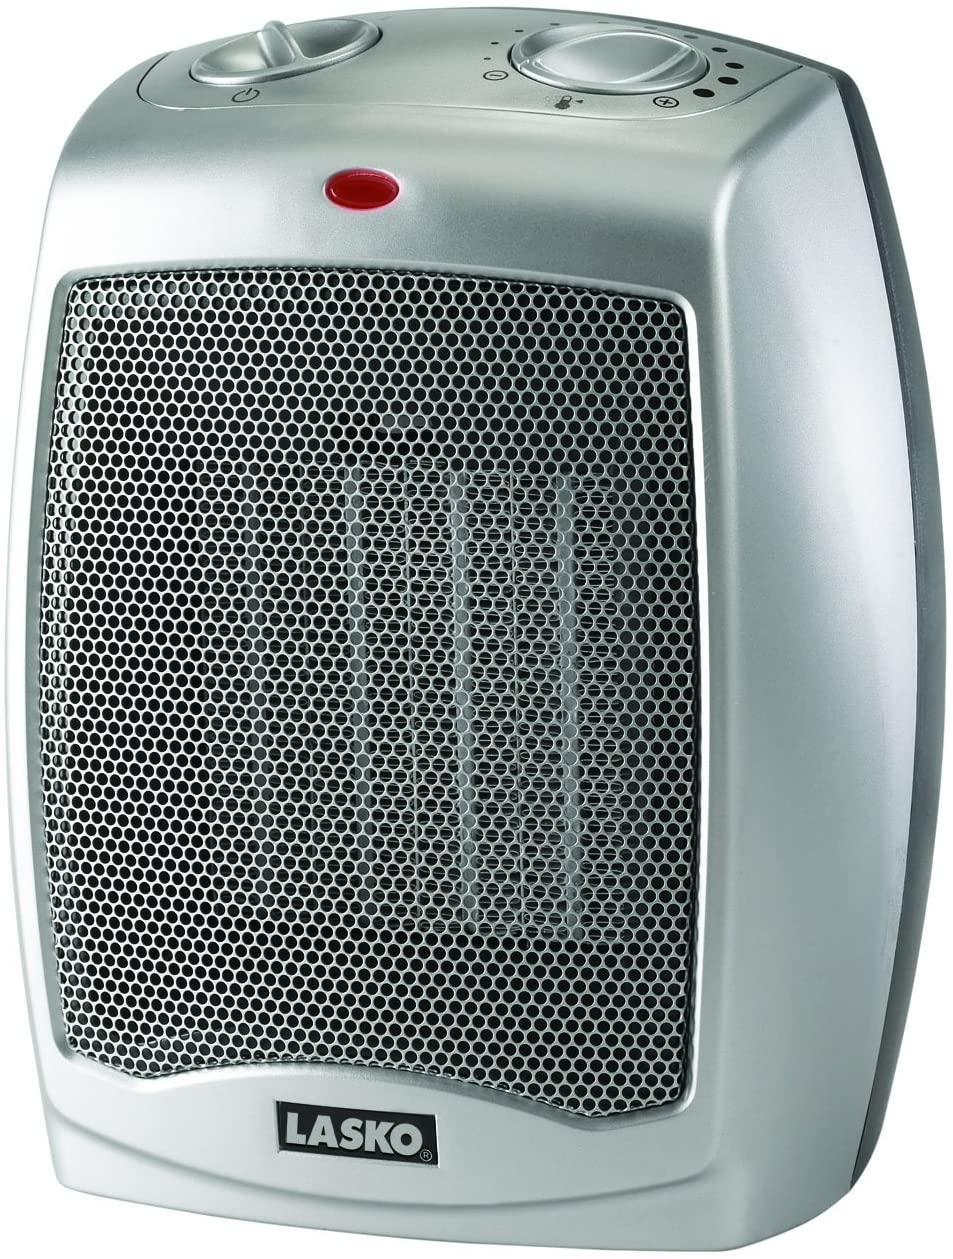 Lasko 754200 Ceramic Space Heater with Adjustable Thermostat